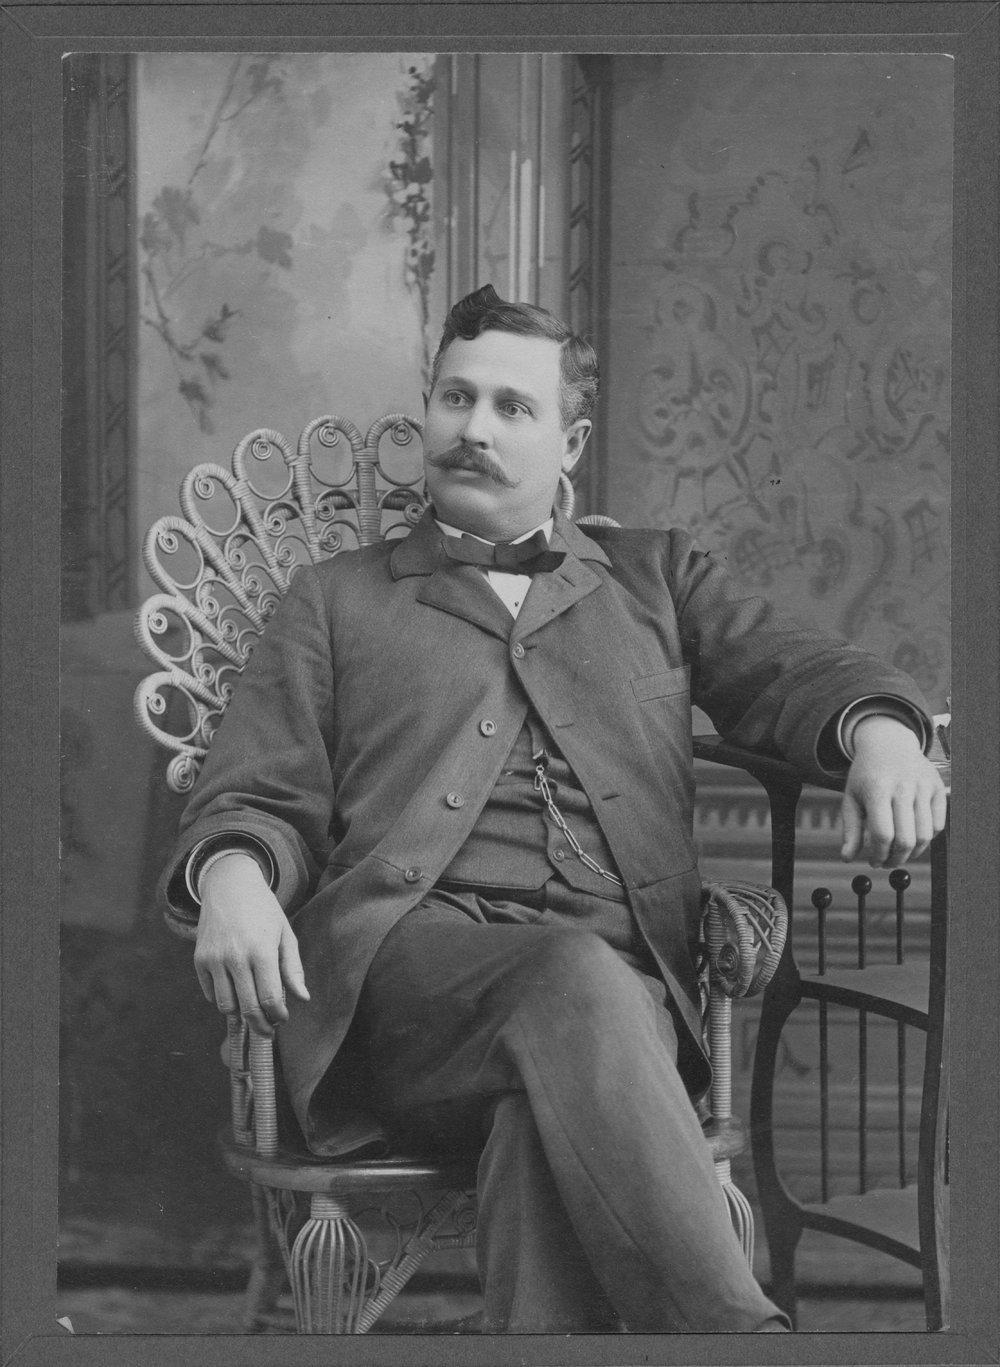 John William Breidenthal